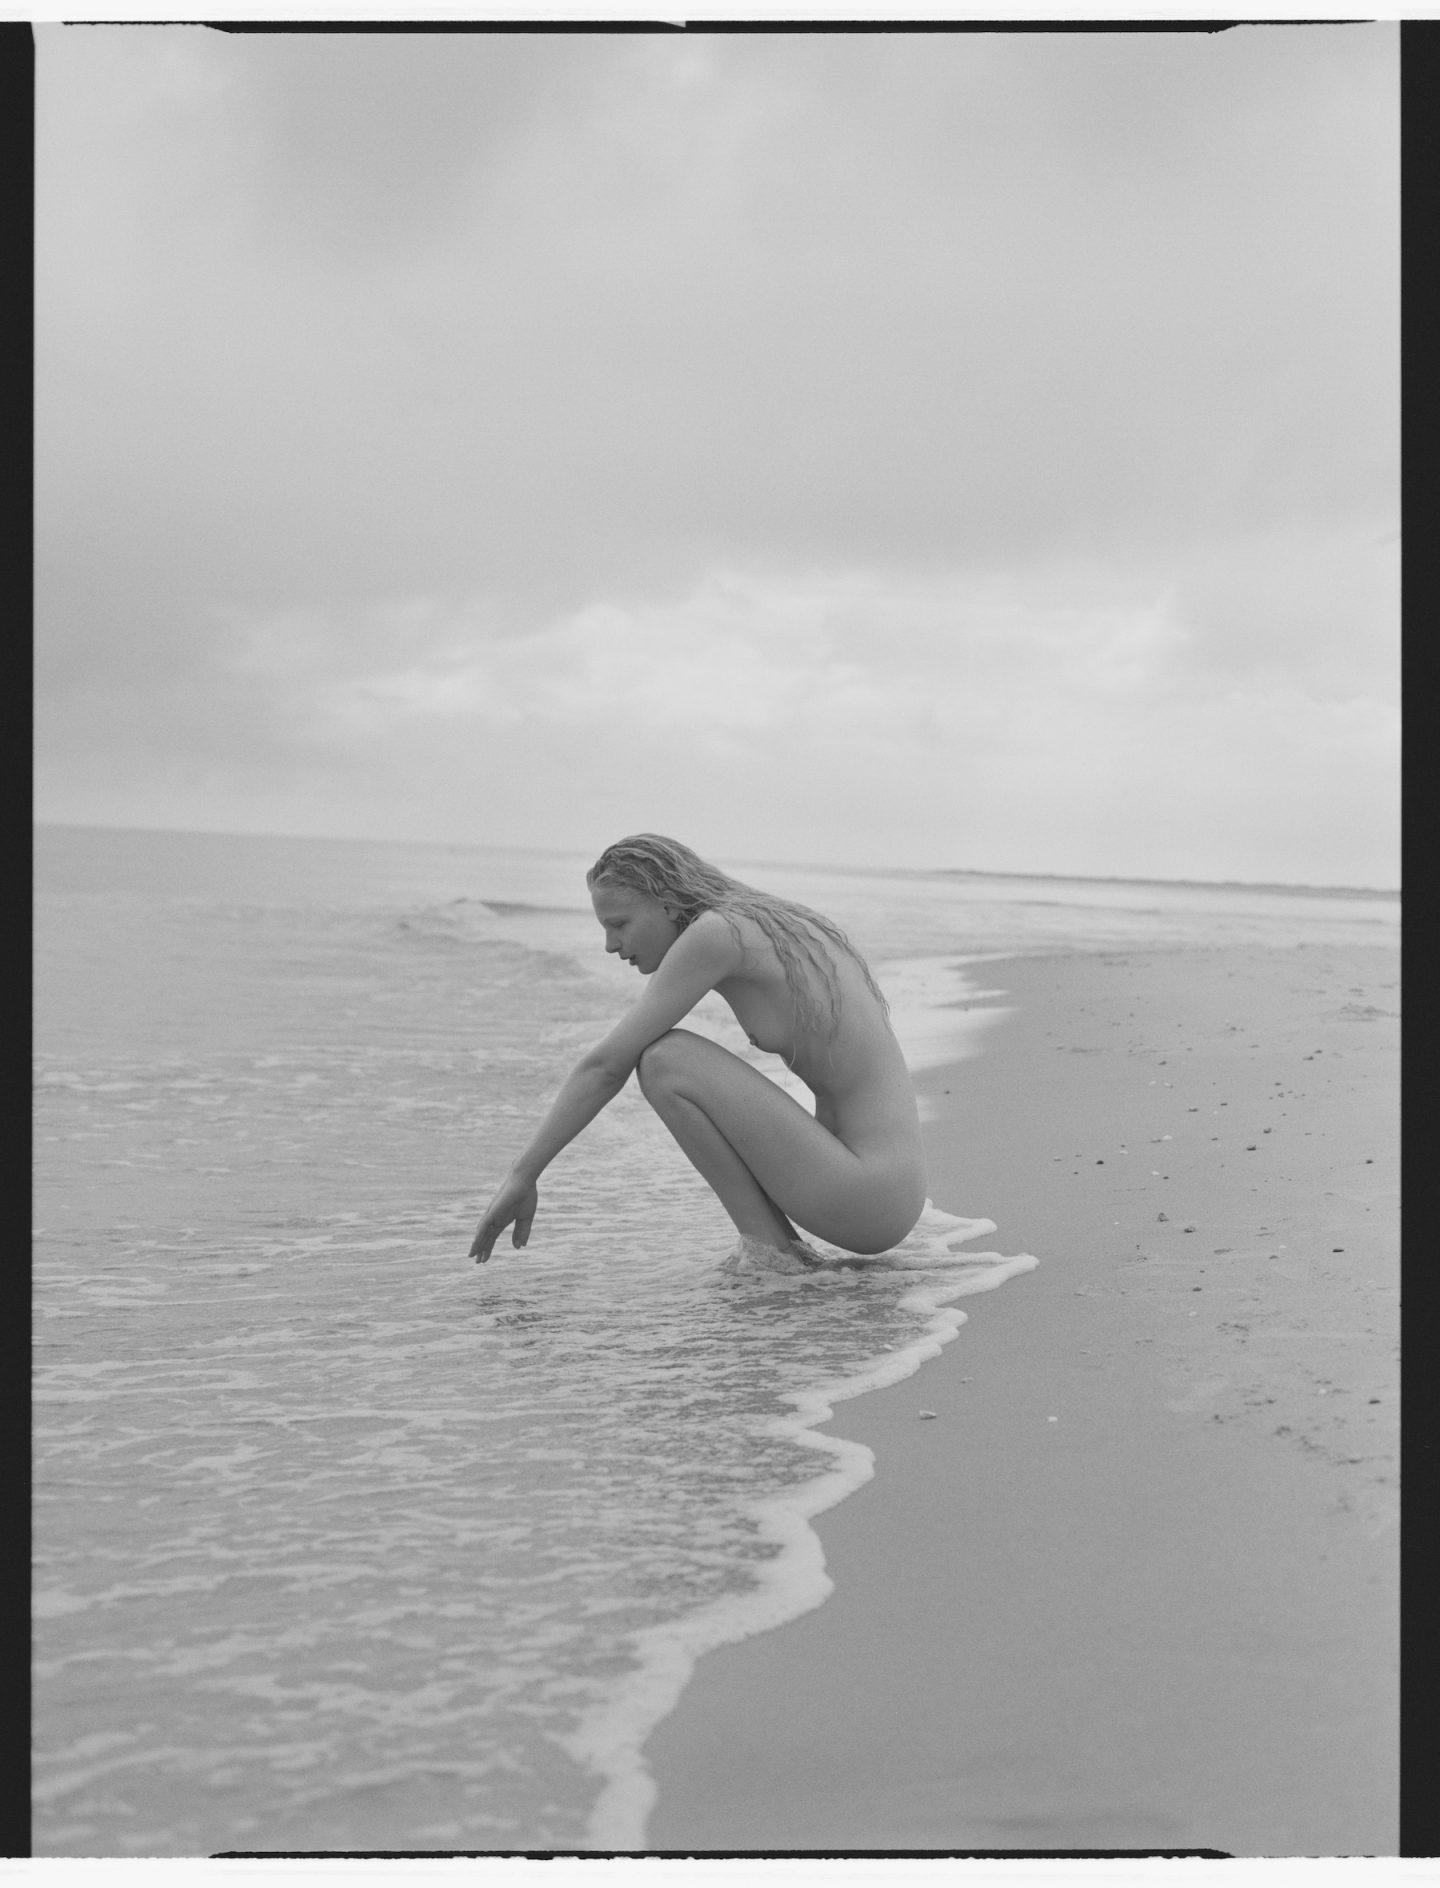 IGNANT-Photography-Tekla-Philip-Messmann-012